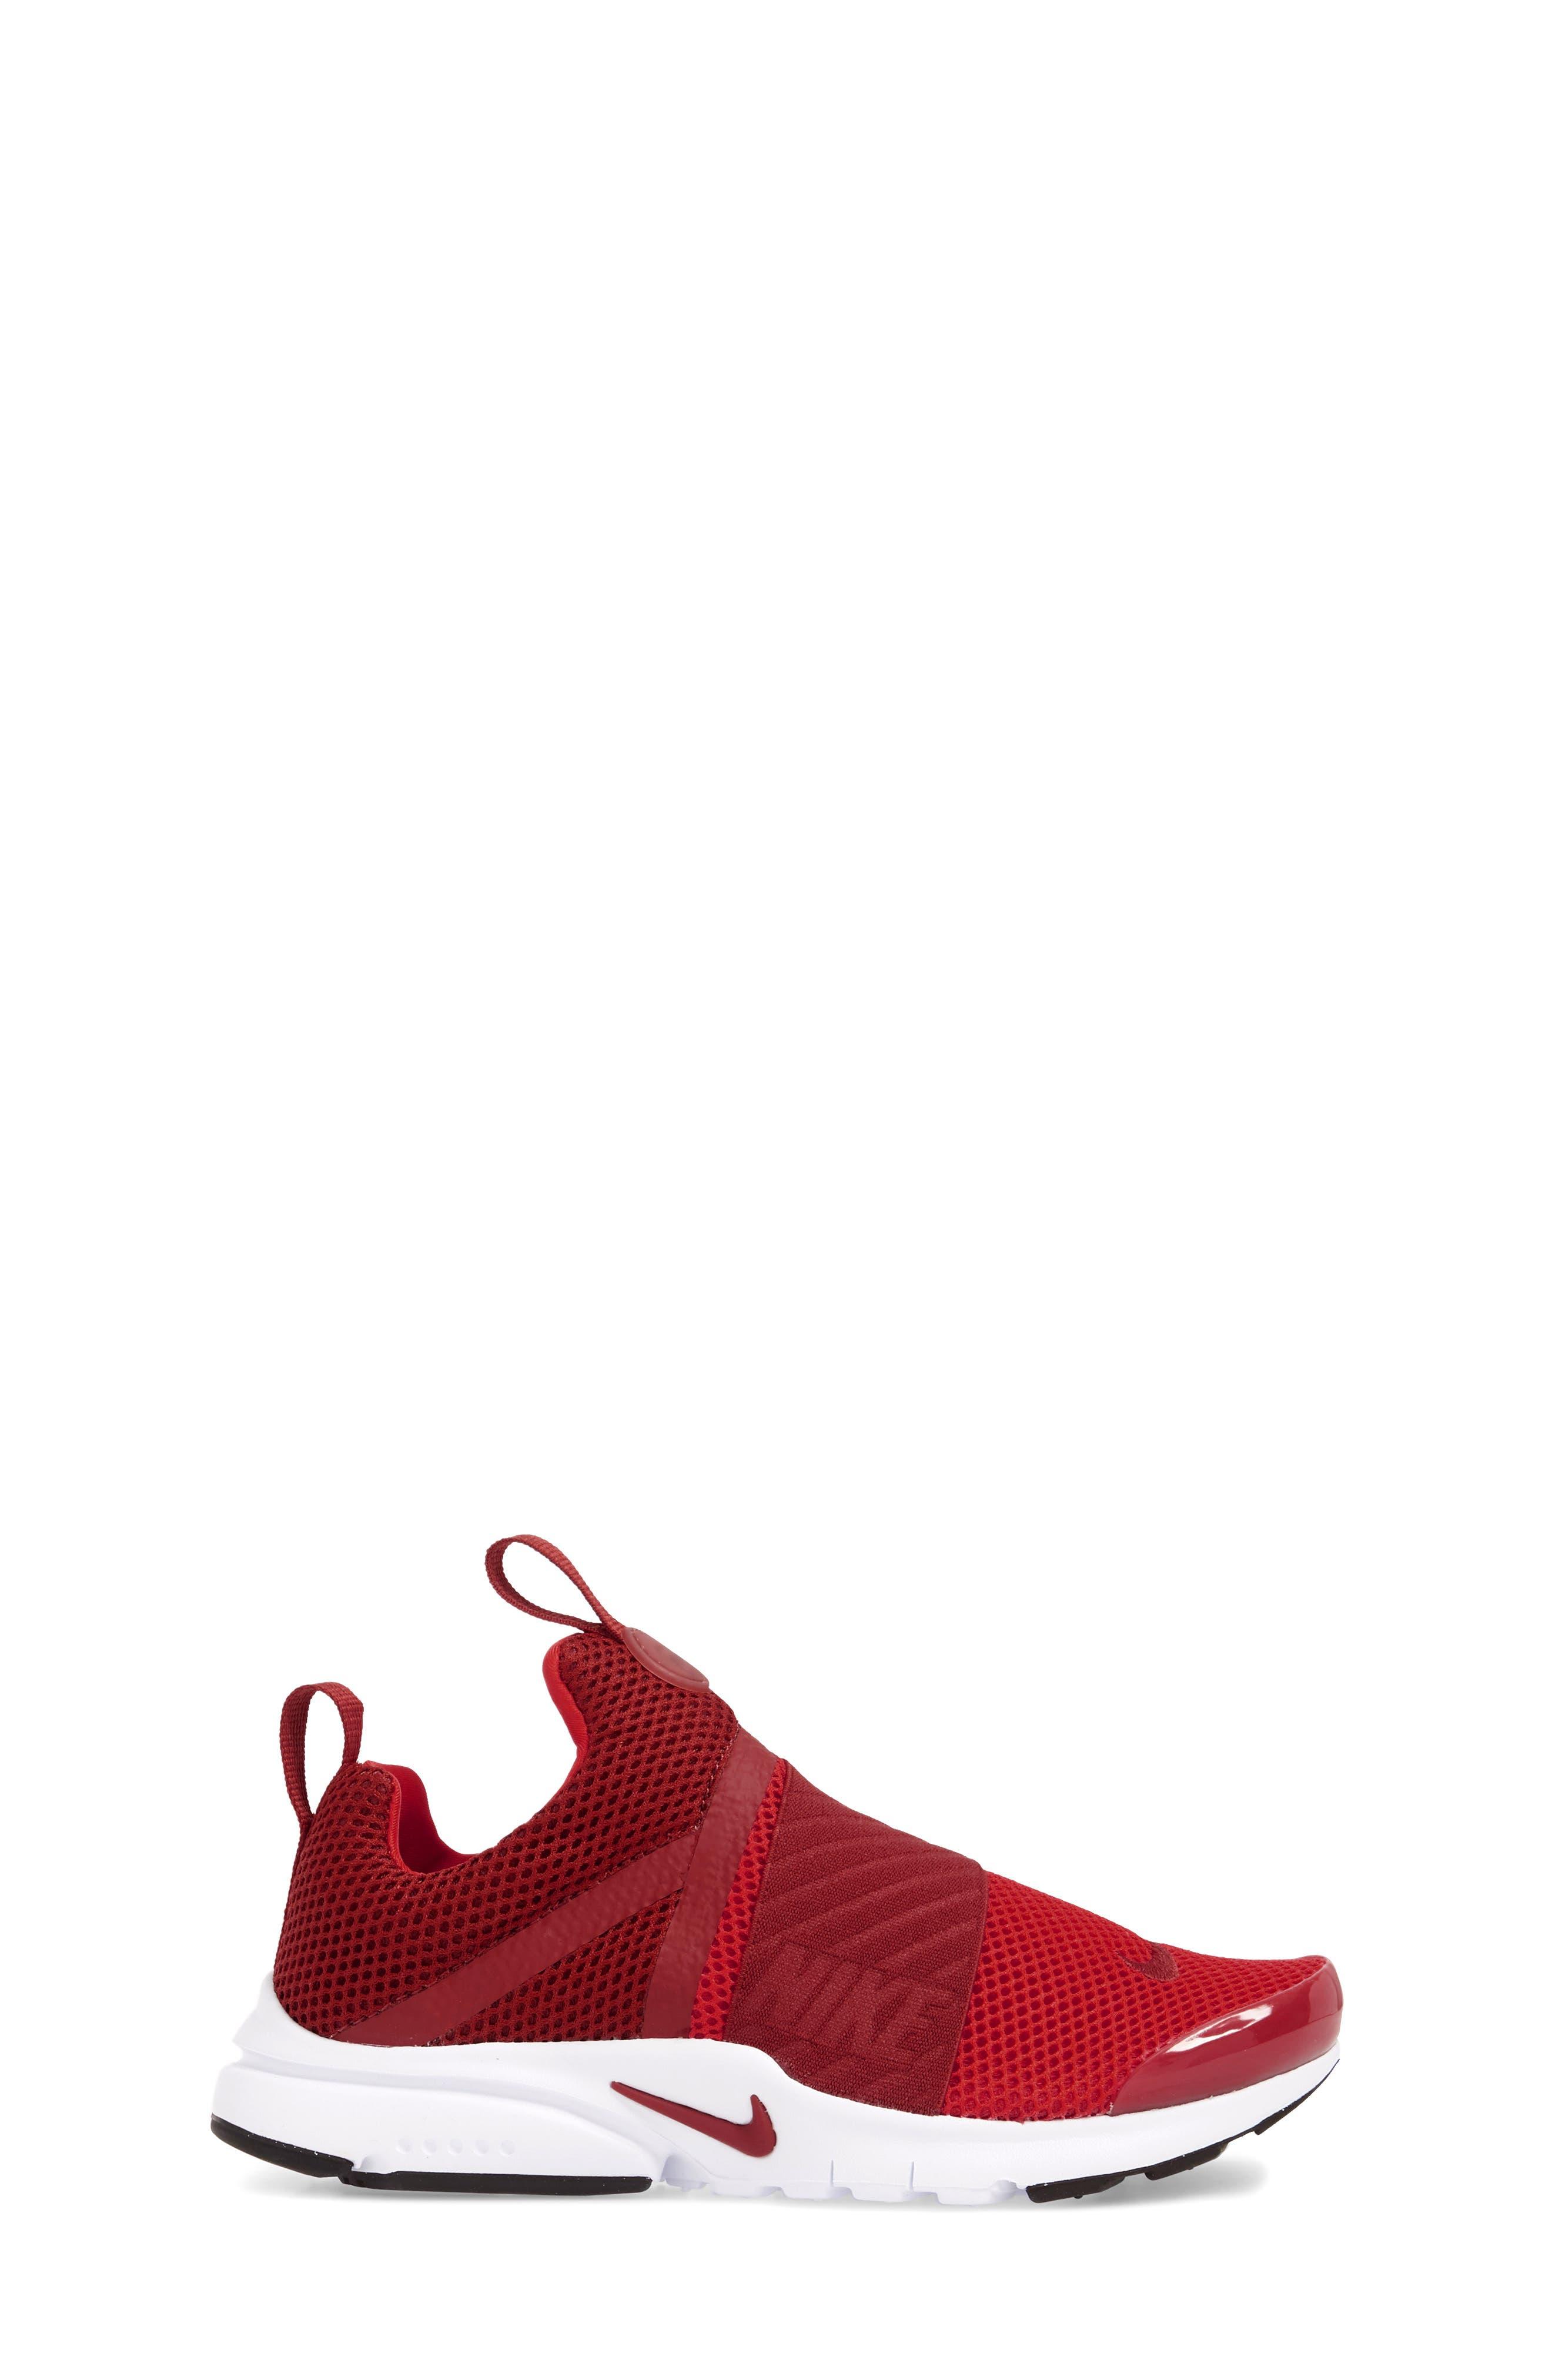 Presto Extreme Sneaker,                             Alternate thumbnail 28, color,